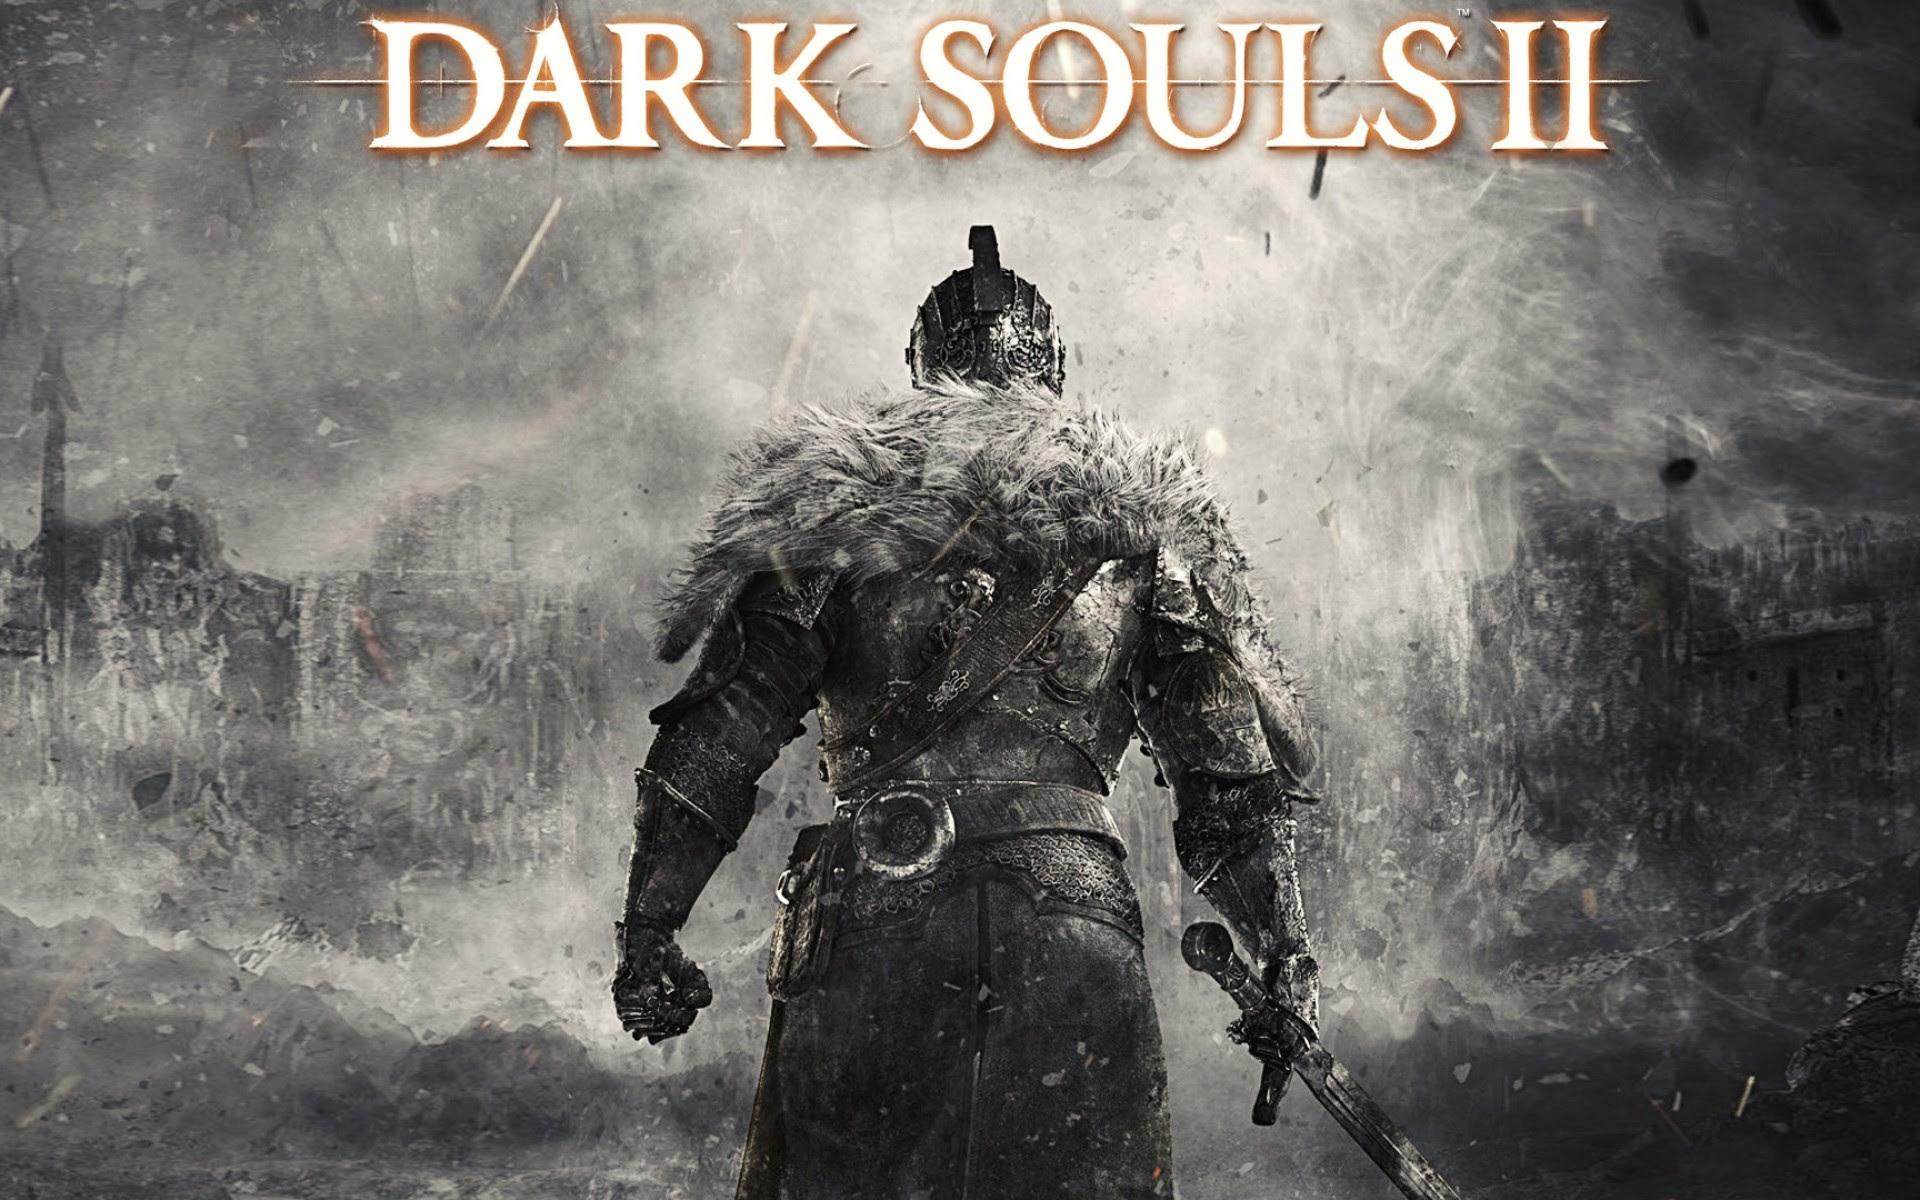 Dark Souls 2 Wallpaper 1920x1200 3415